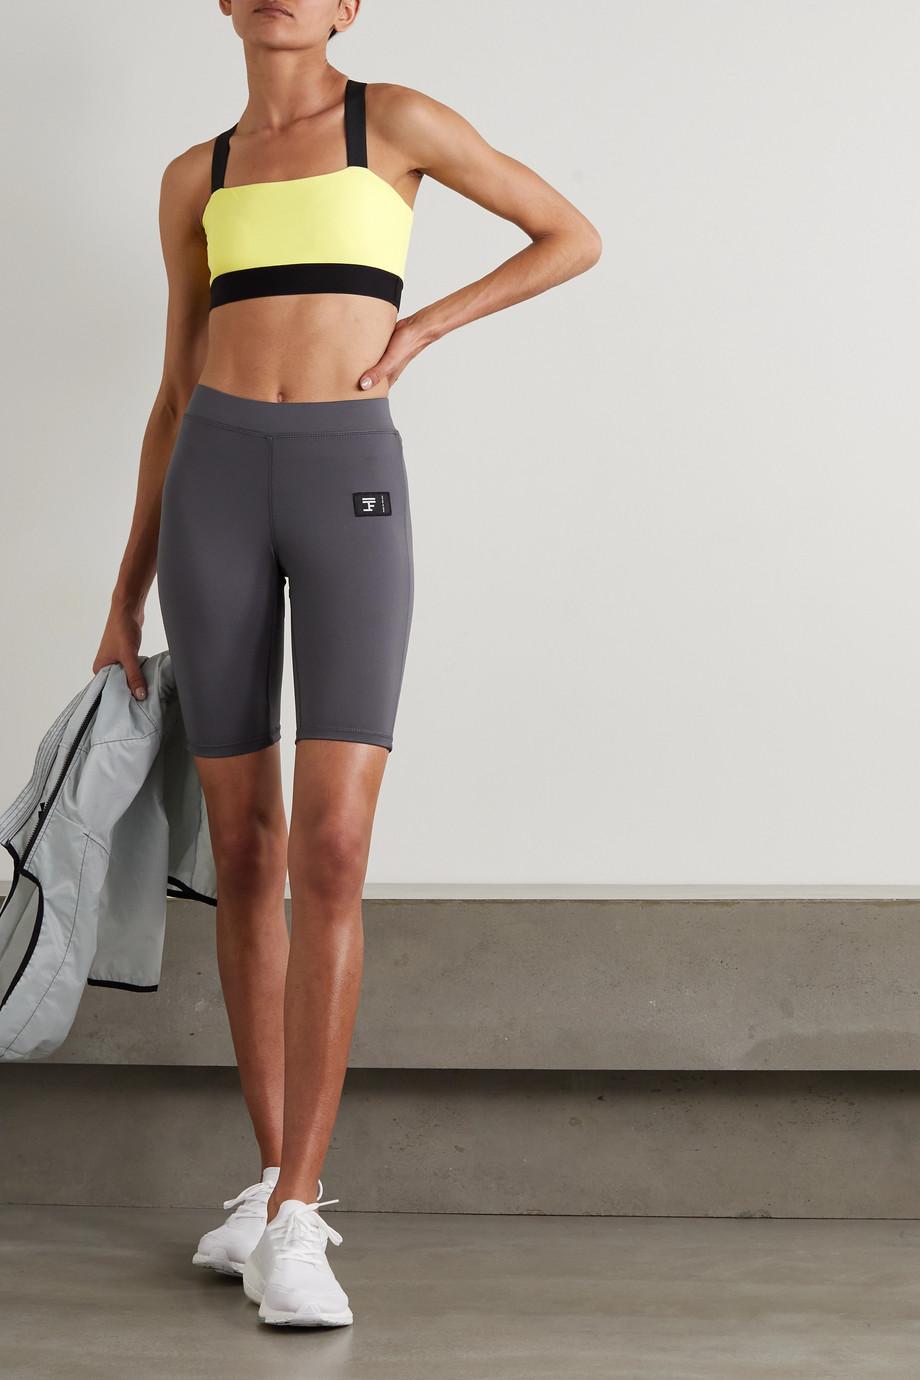 FULL COURT SPORT Stretch-jersey sports bra